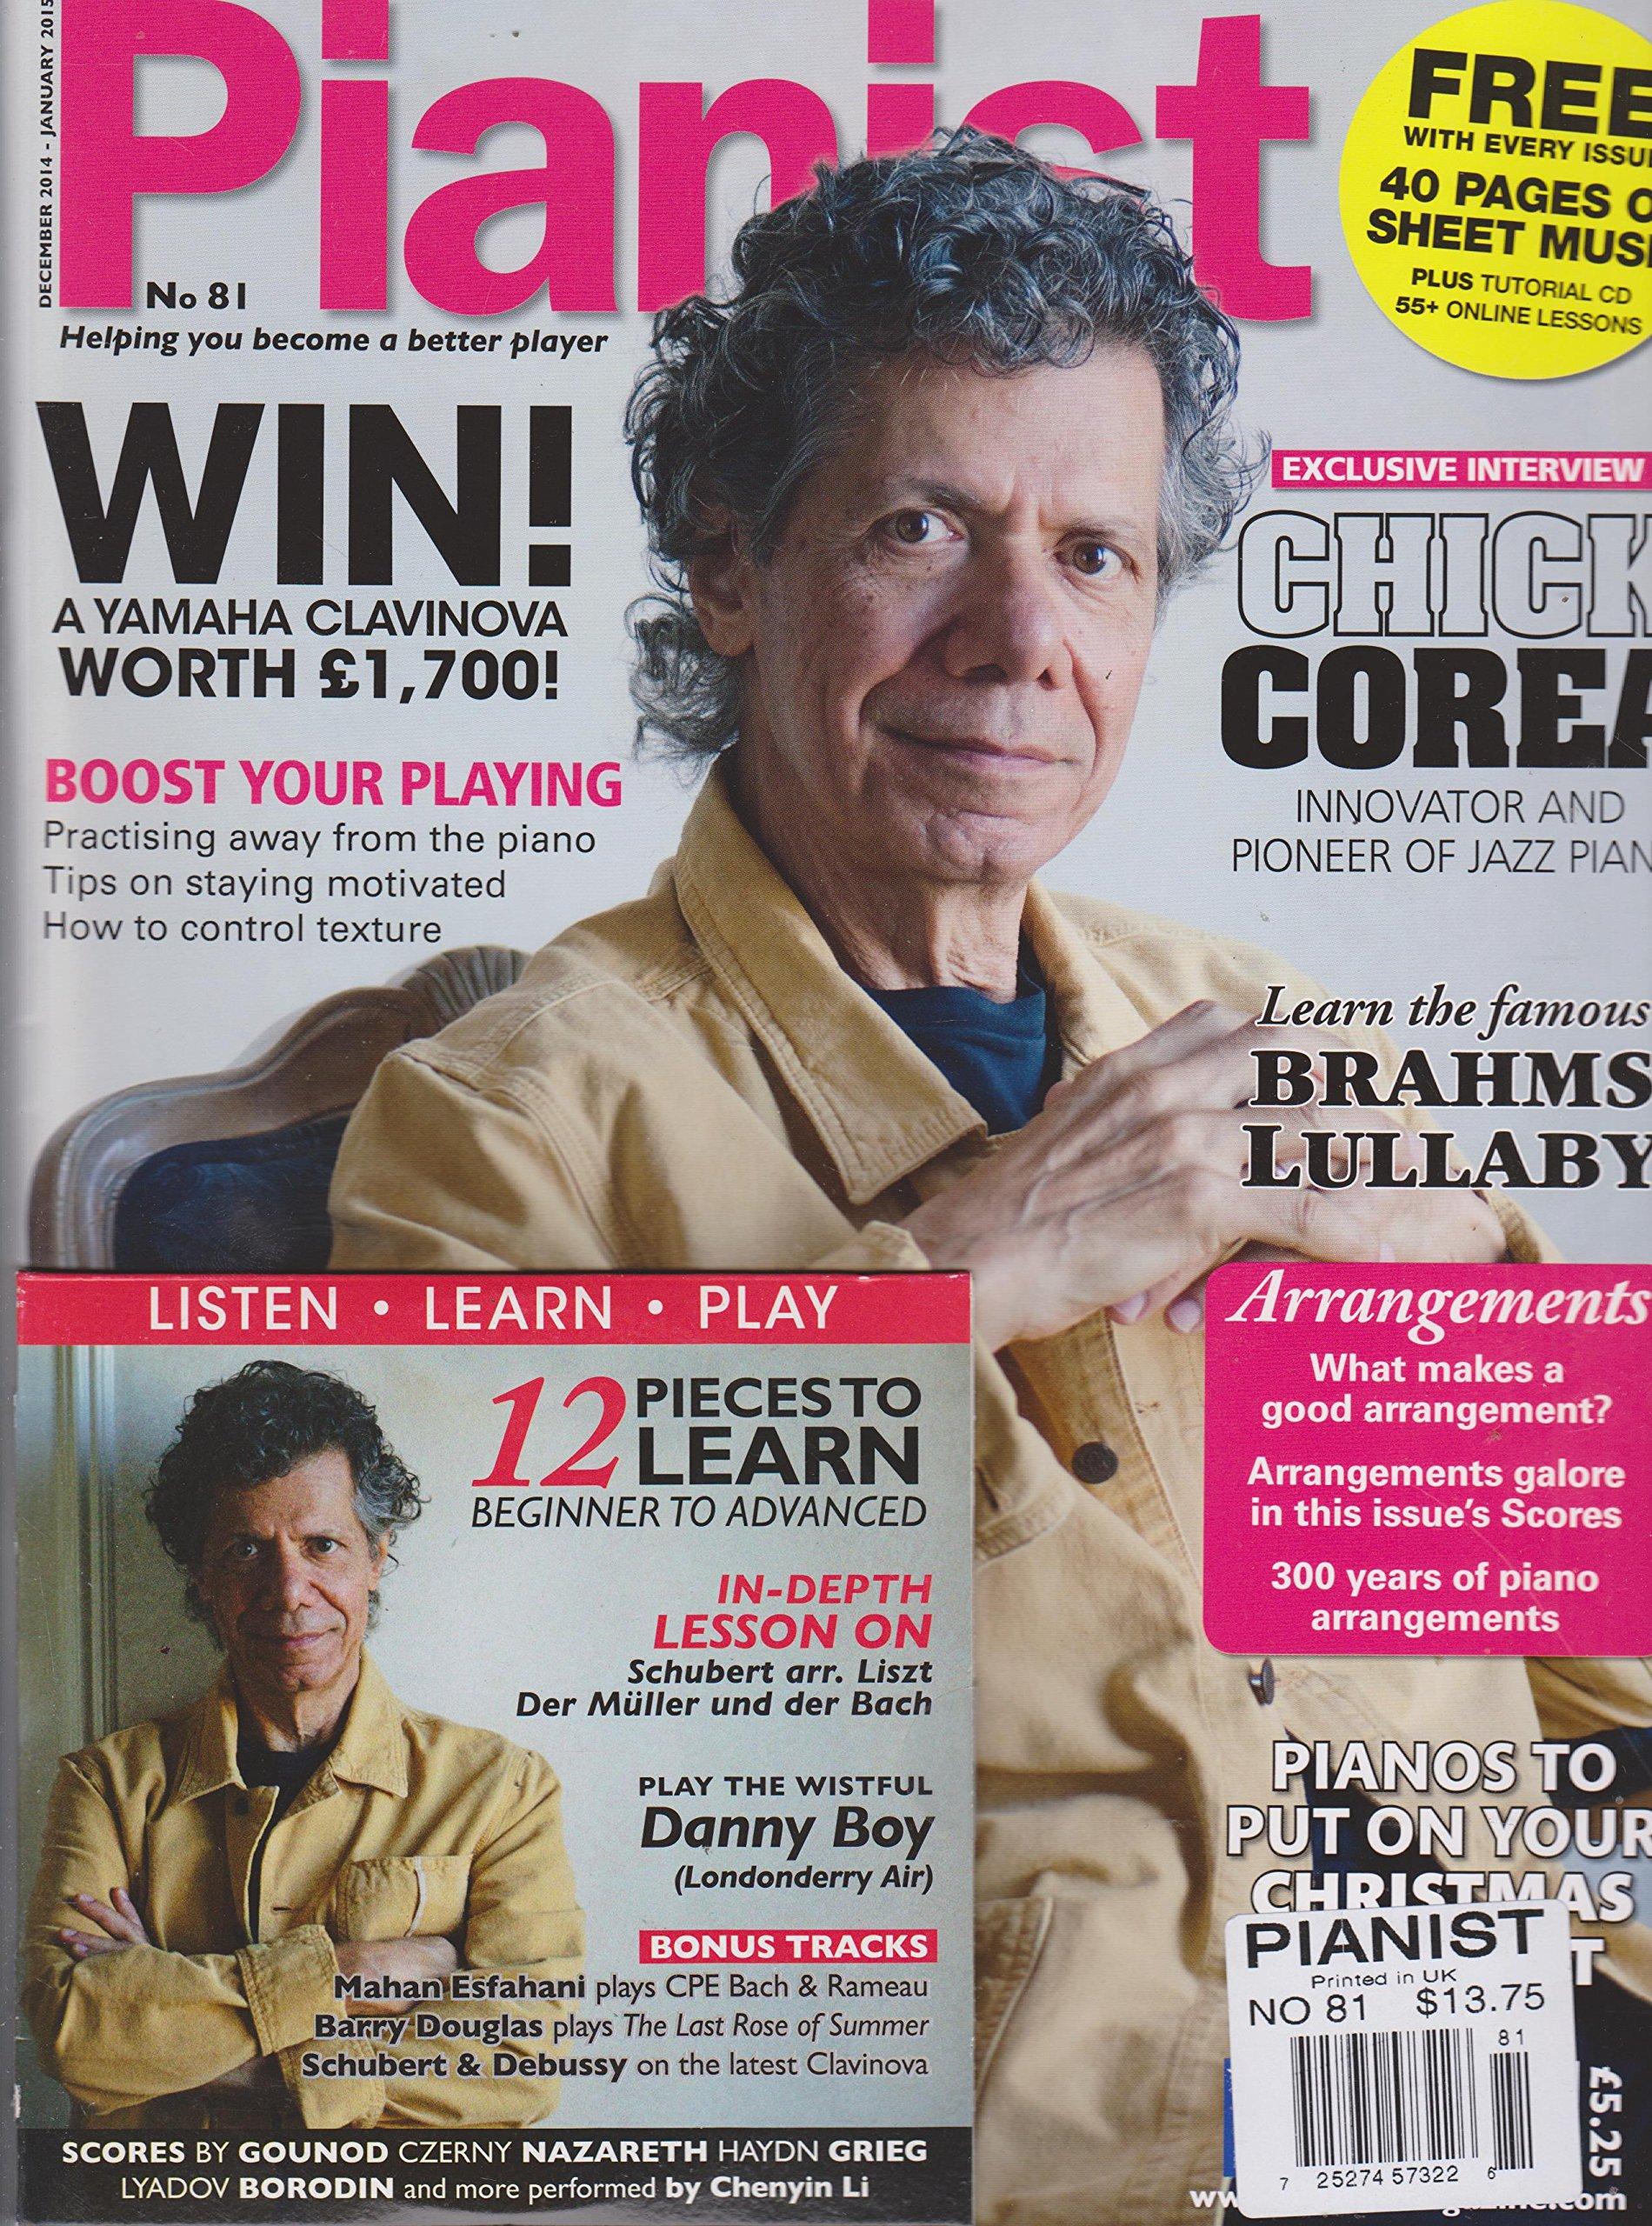 Pianist Magazine Number 81 December 2014-January 2015 PDF